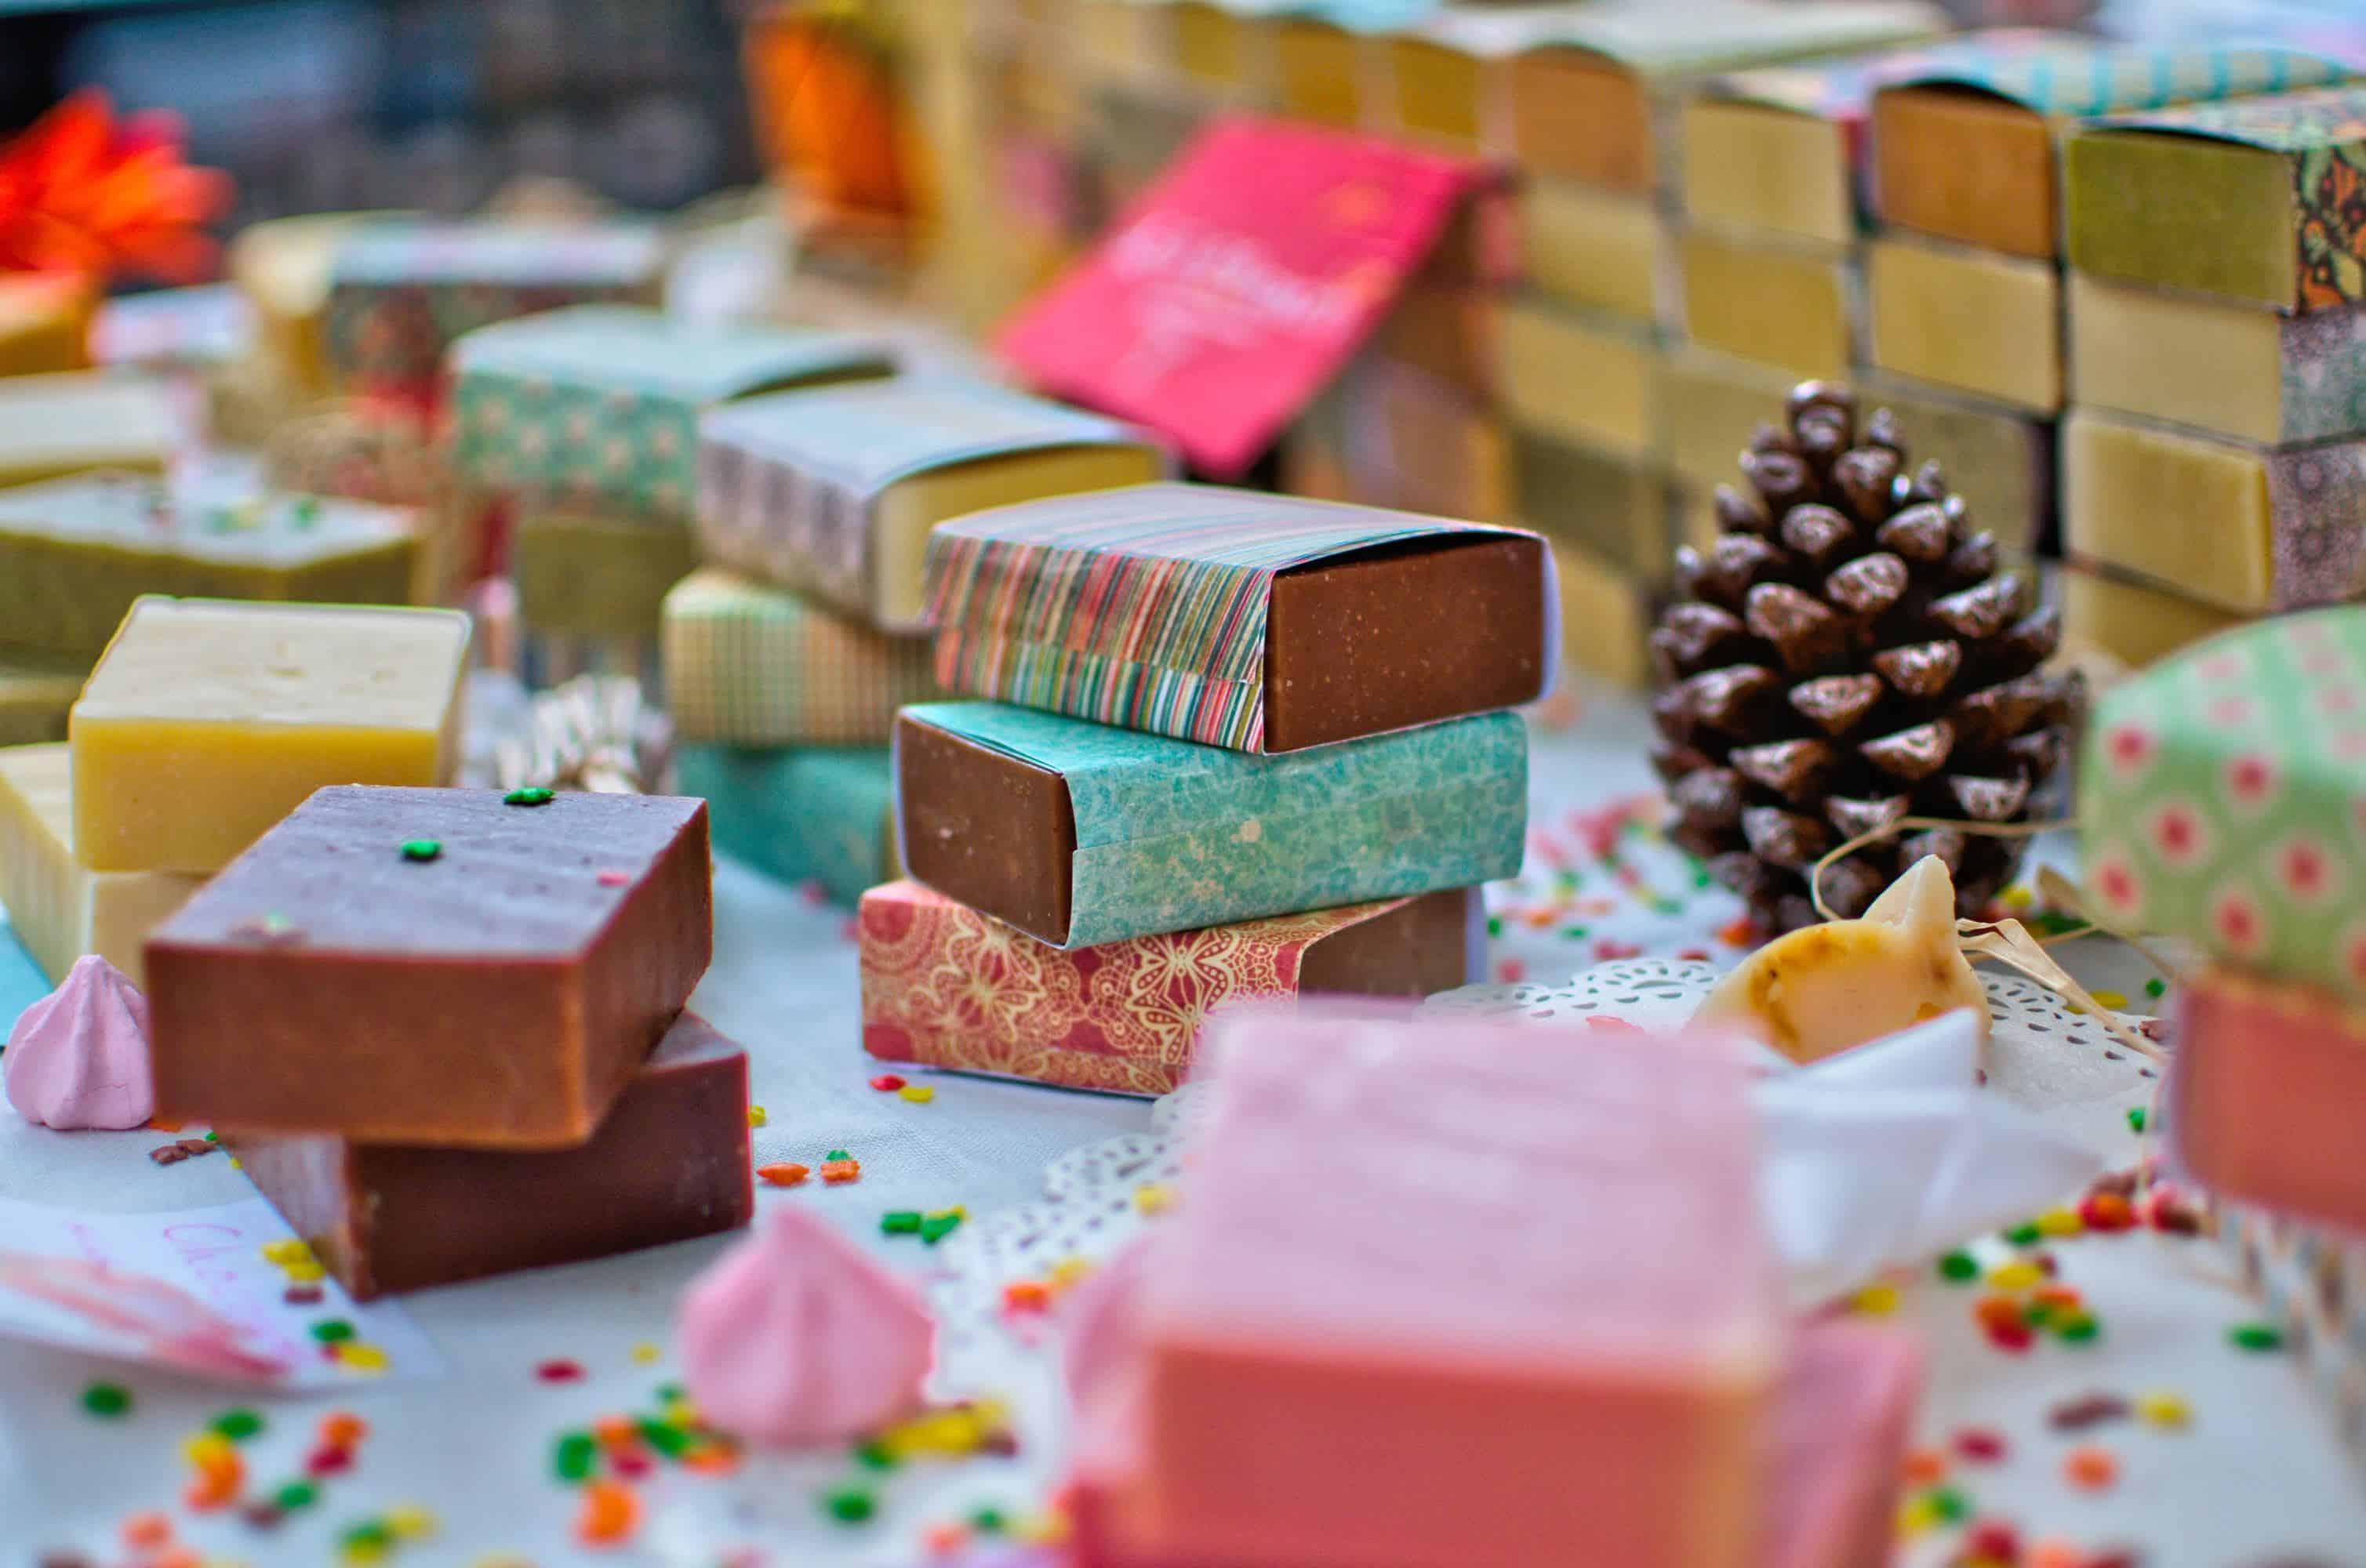 How to make your house smell like Christmas! 15 easy ways, including homemade air fresheners, potpourri, and festive Christmas essential oils.